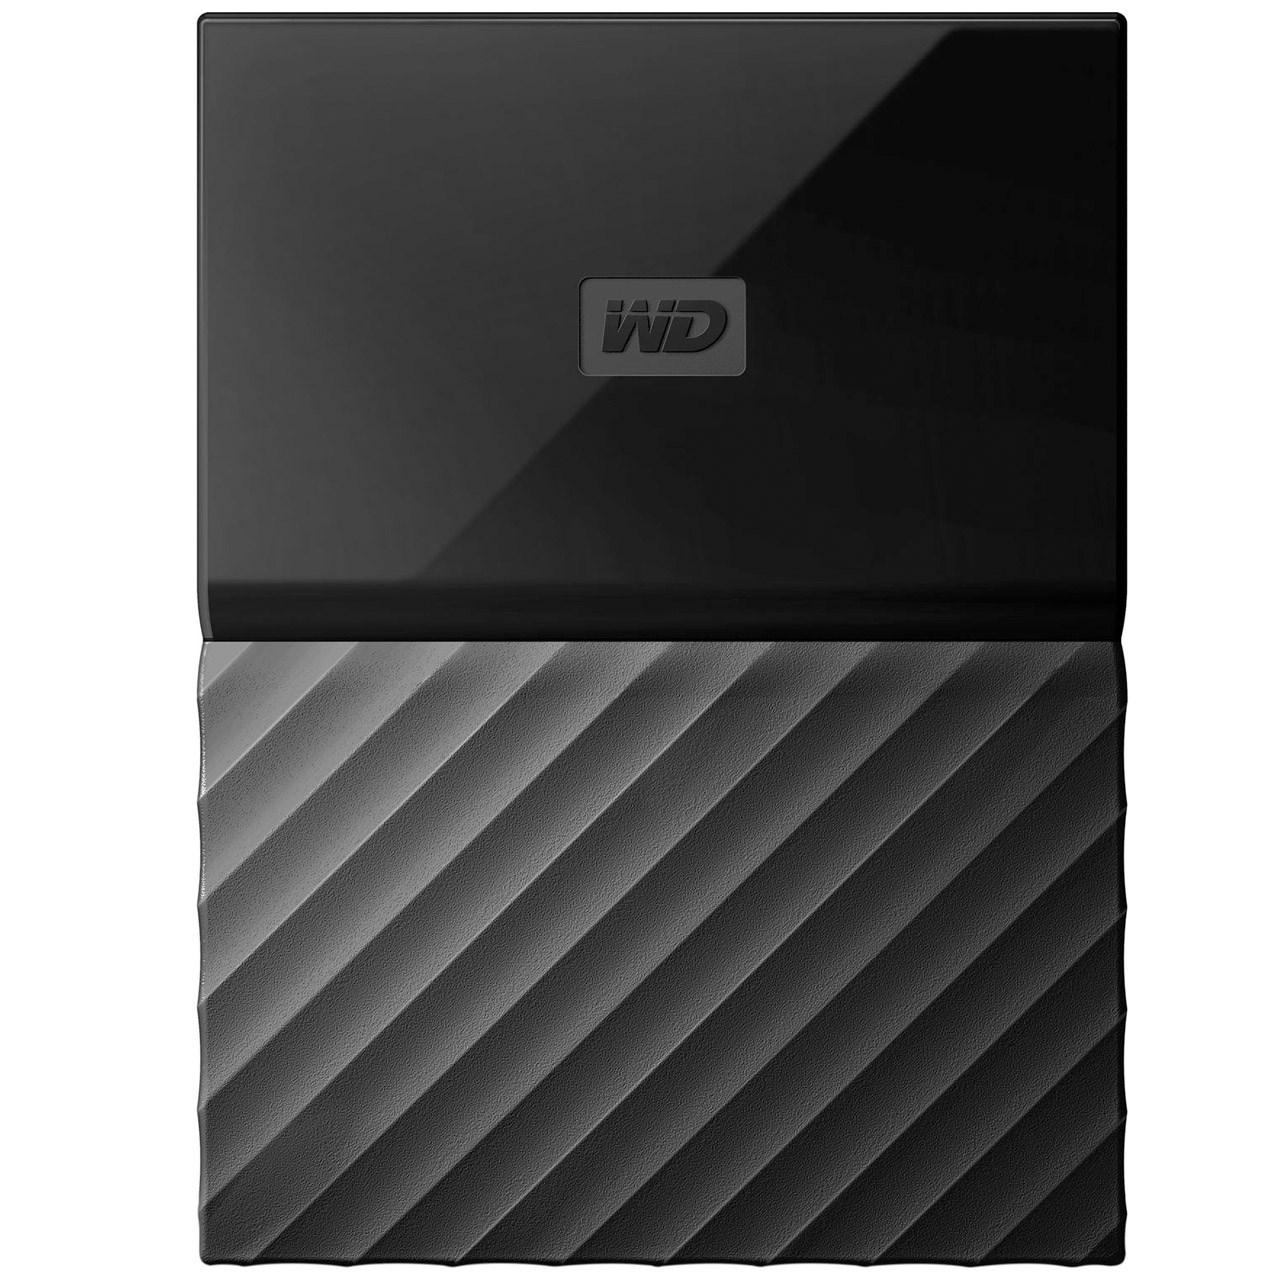 هارددیسک اکسترنال وسترن دیجیتال مدل My Passport WDBYFT0040B ظرفیت 4 ترابایت | Western Digital My Passport WDBYFT0040B External Hard Drive - 4TB